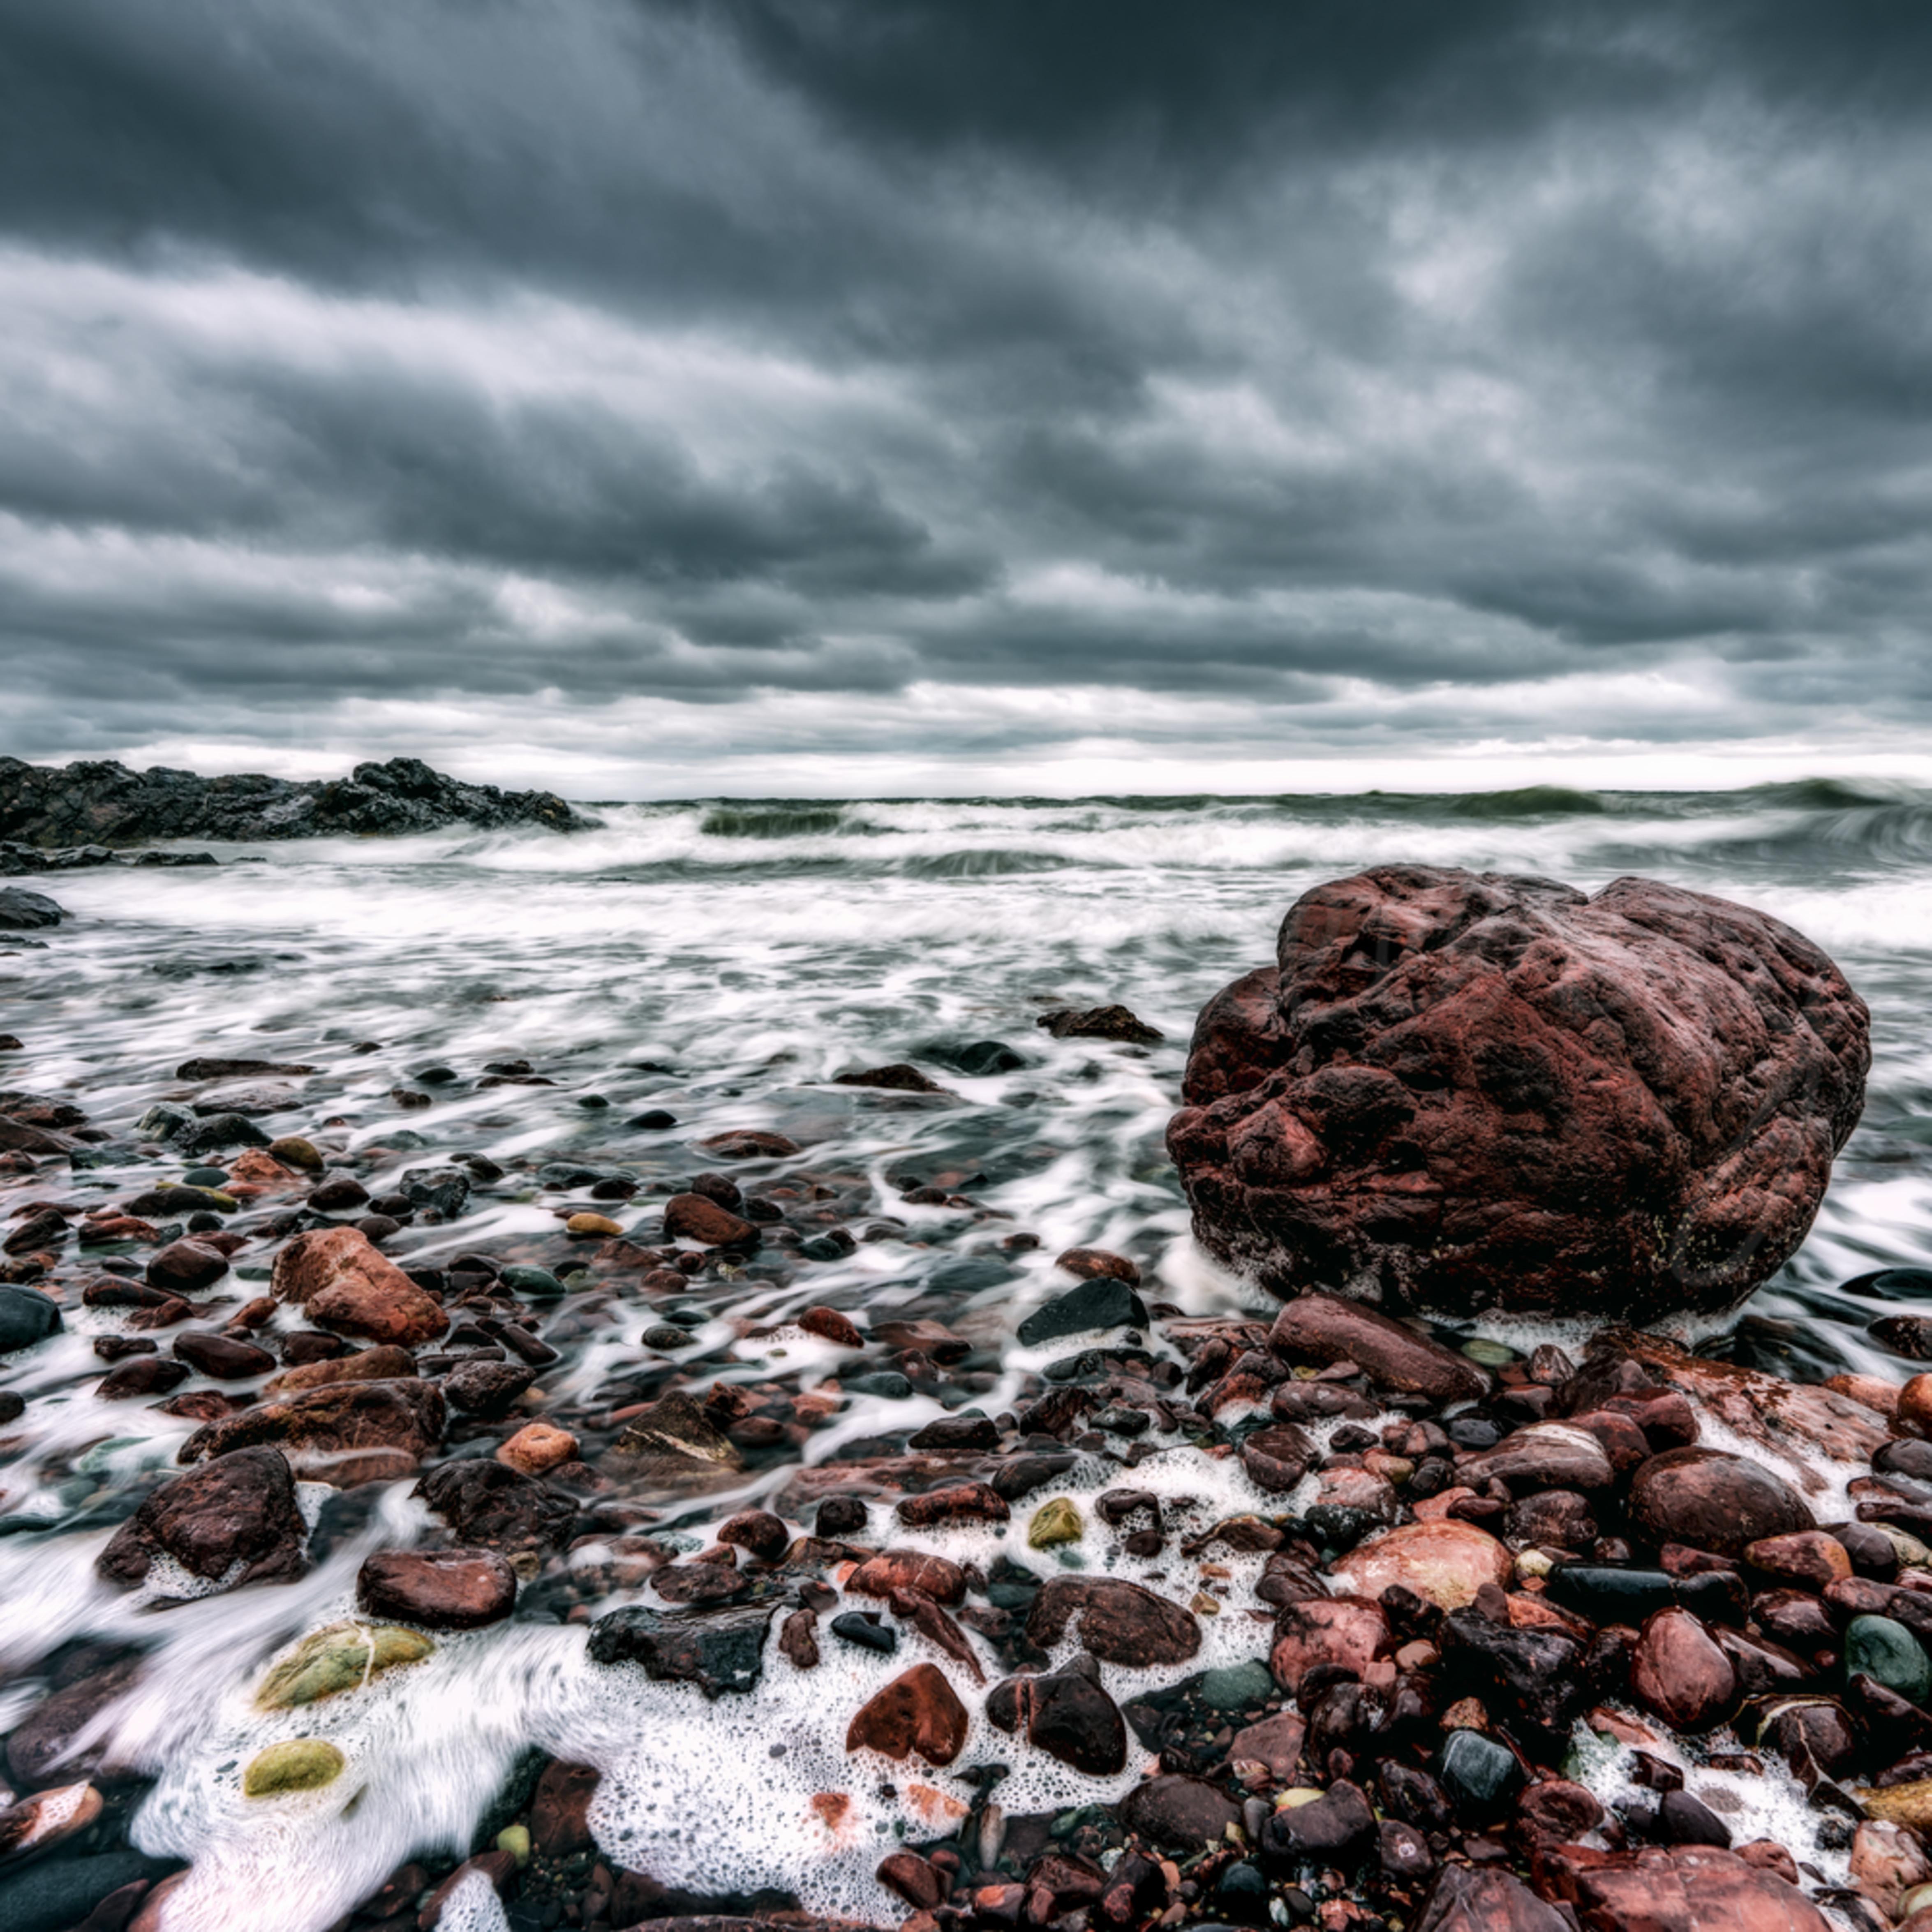 Ocean treasure jfk8tp